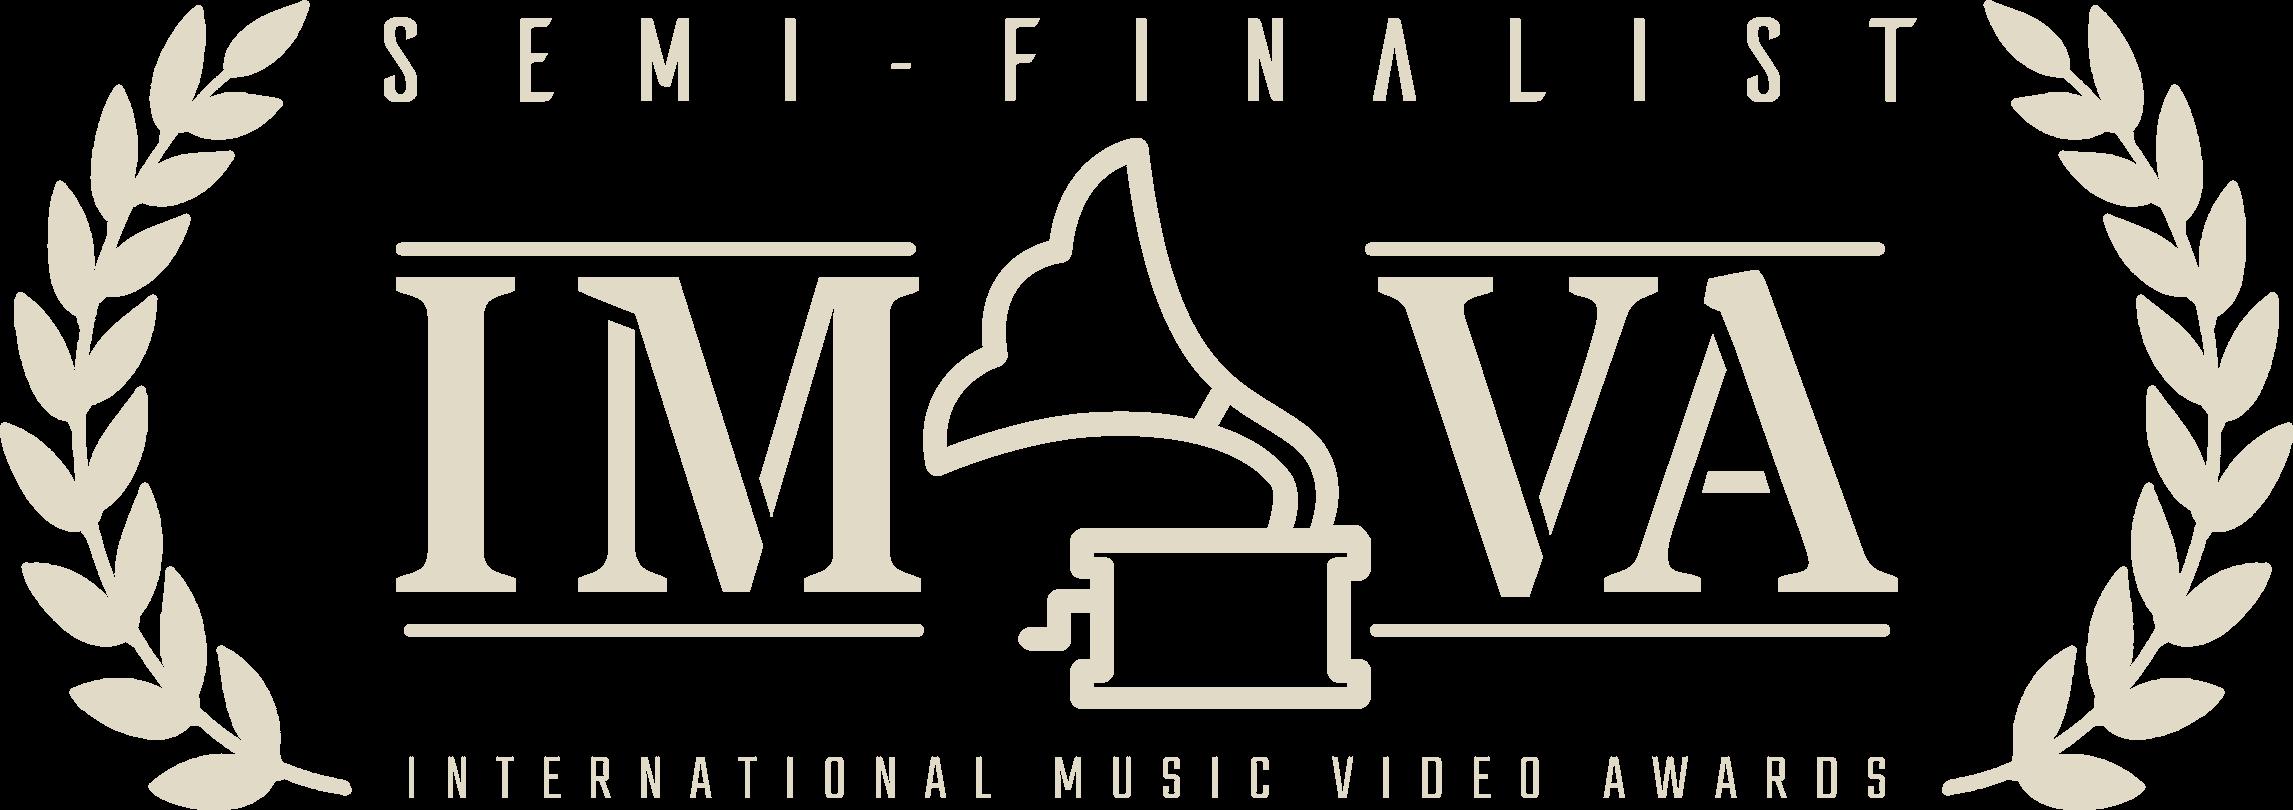 IMVA Semi-Finalist